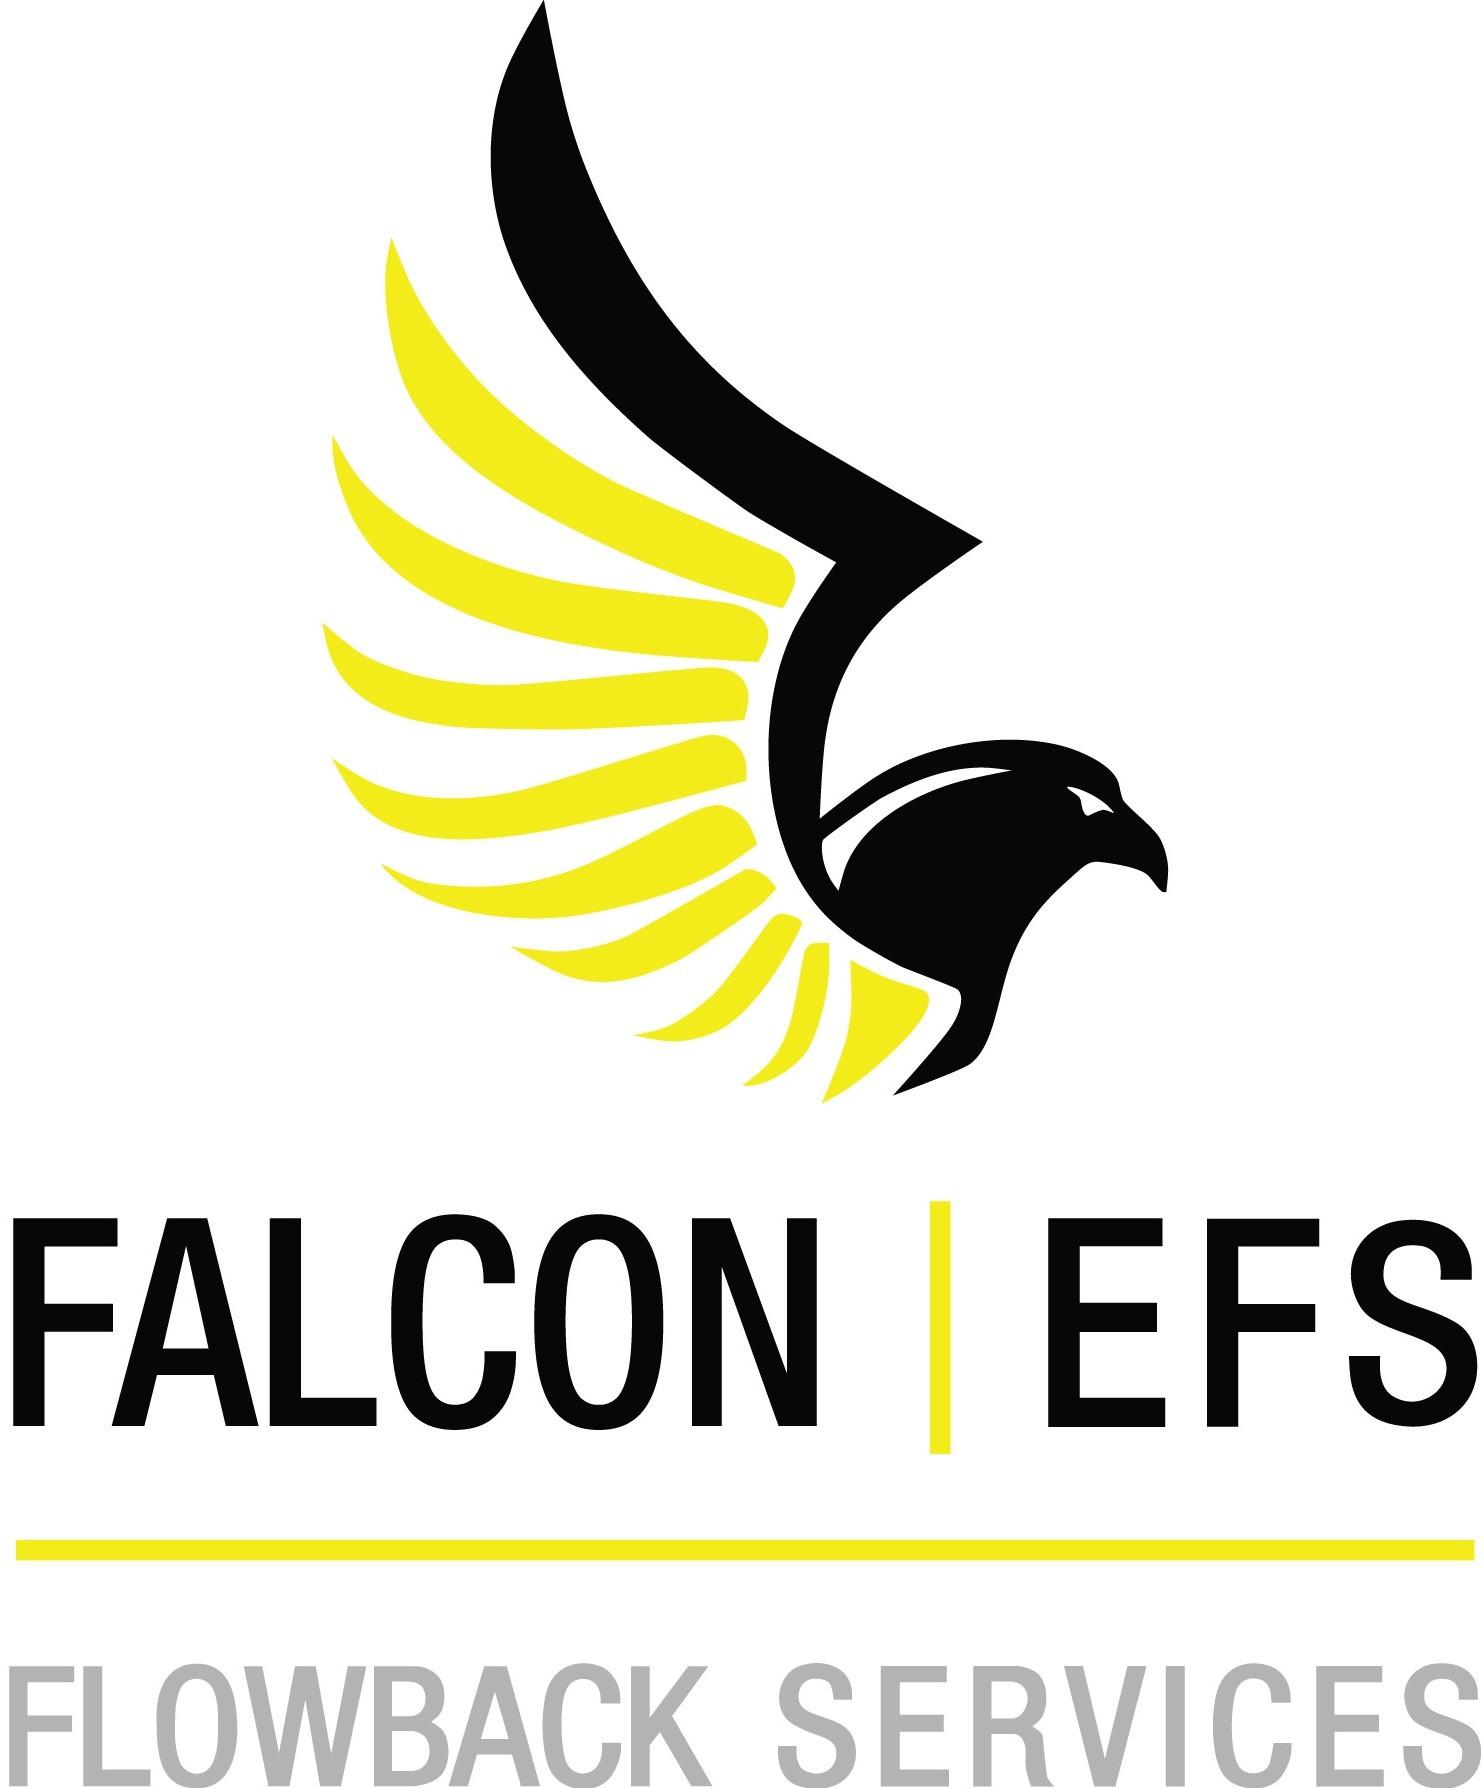 Falcon   EFS Flowback Services   LinkedIn